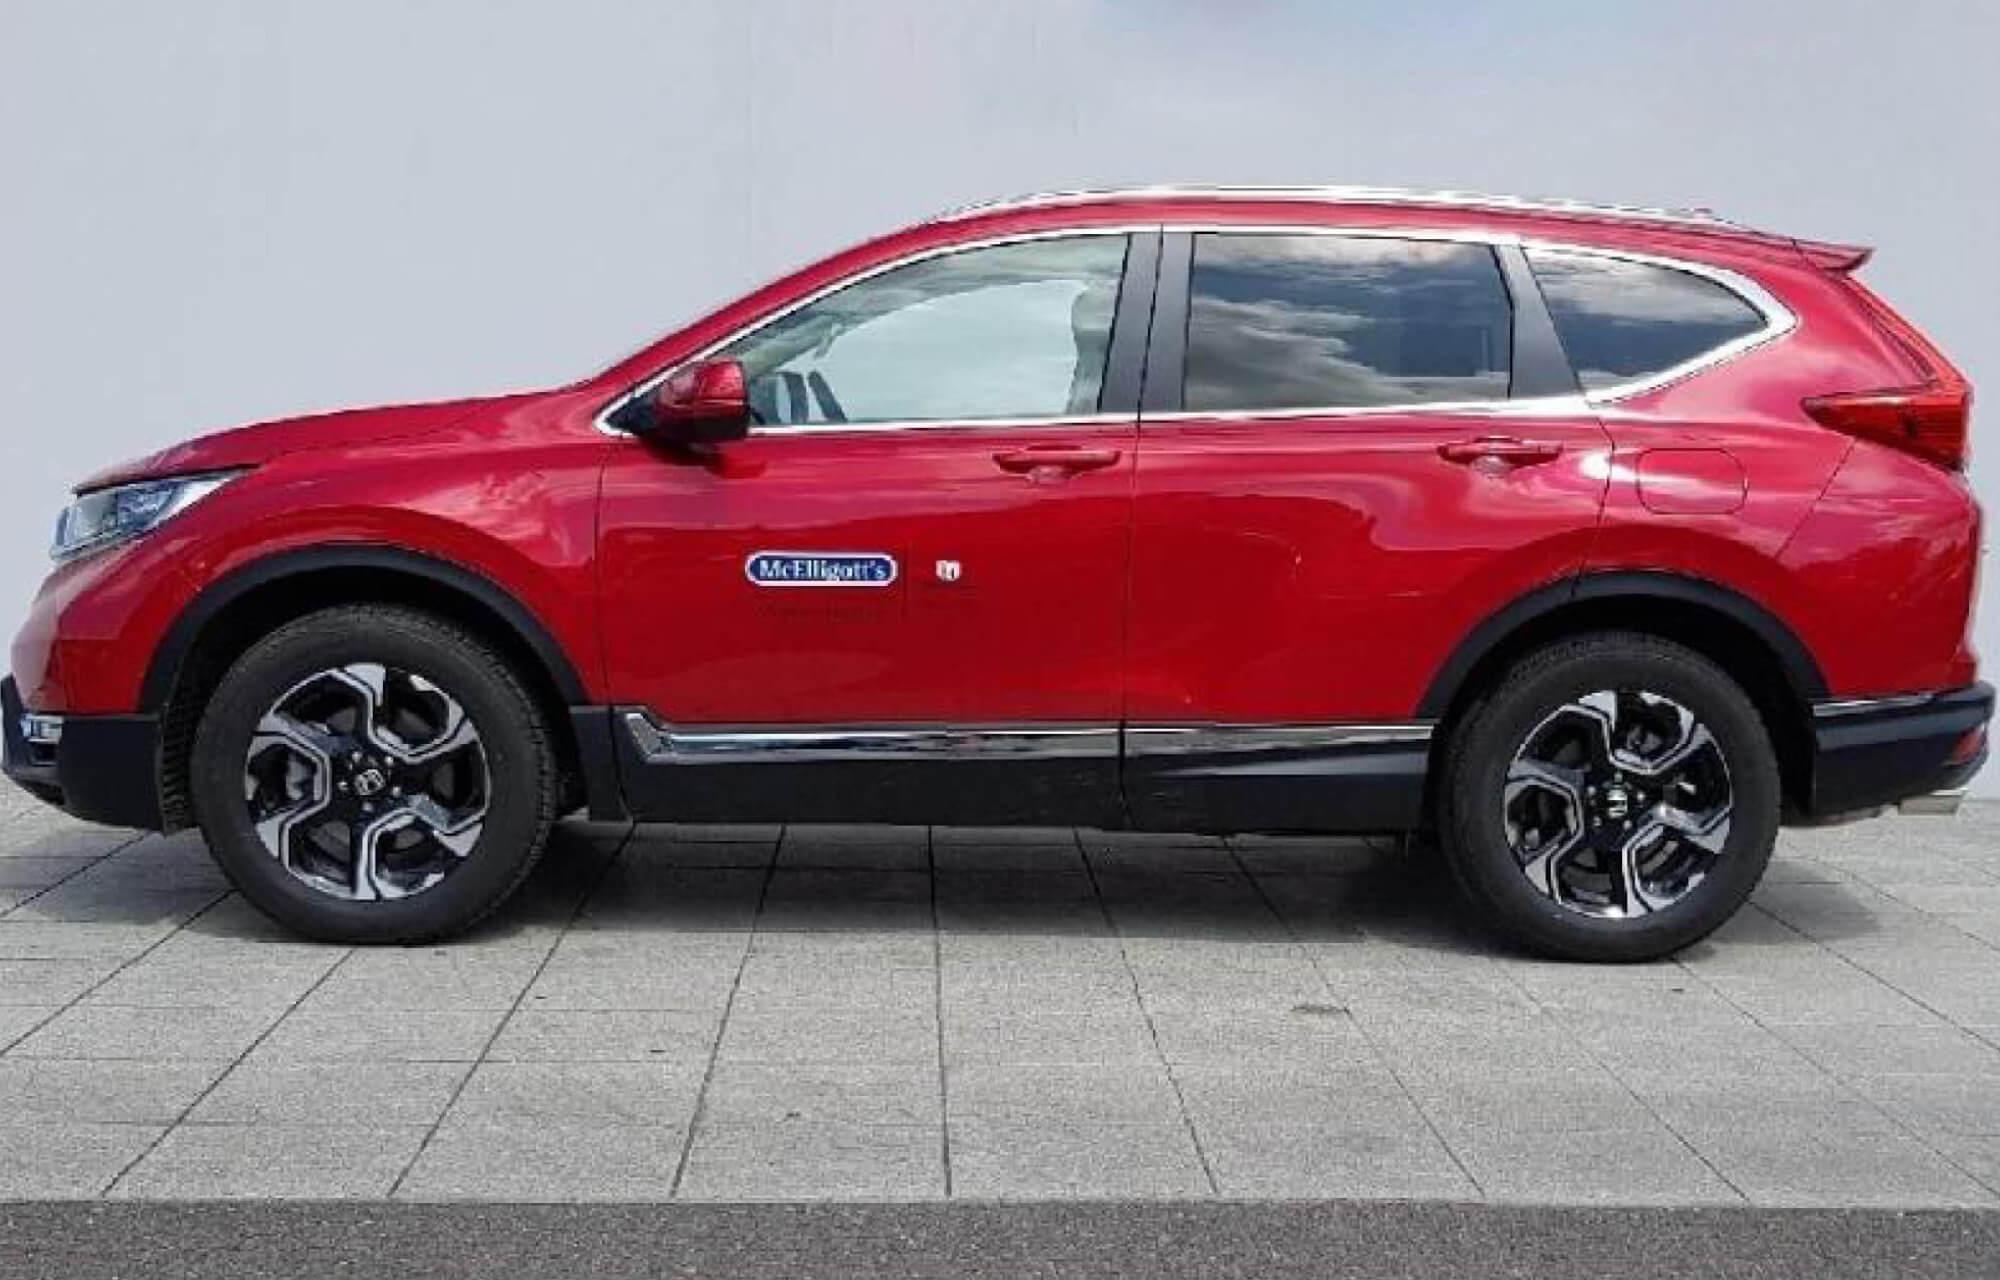 2019 (192) CR-V 1.5 i-VTEC AWD Elegance 7 Seater available at McElligott's Tralee